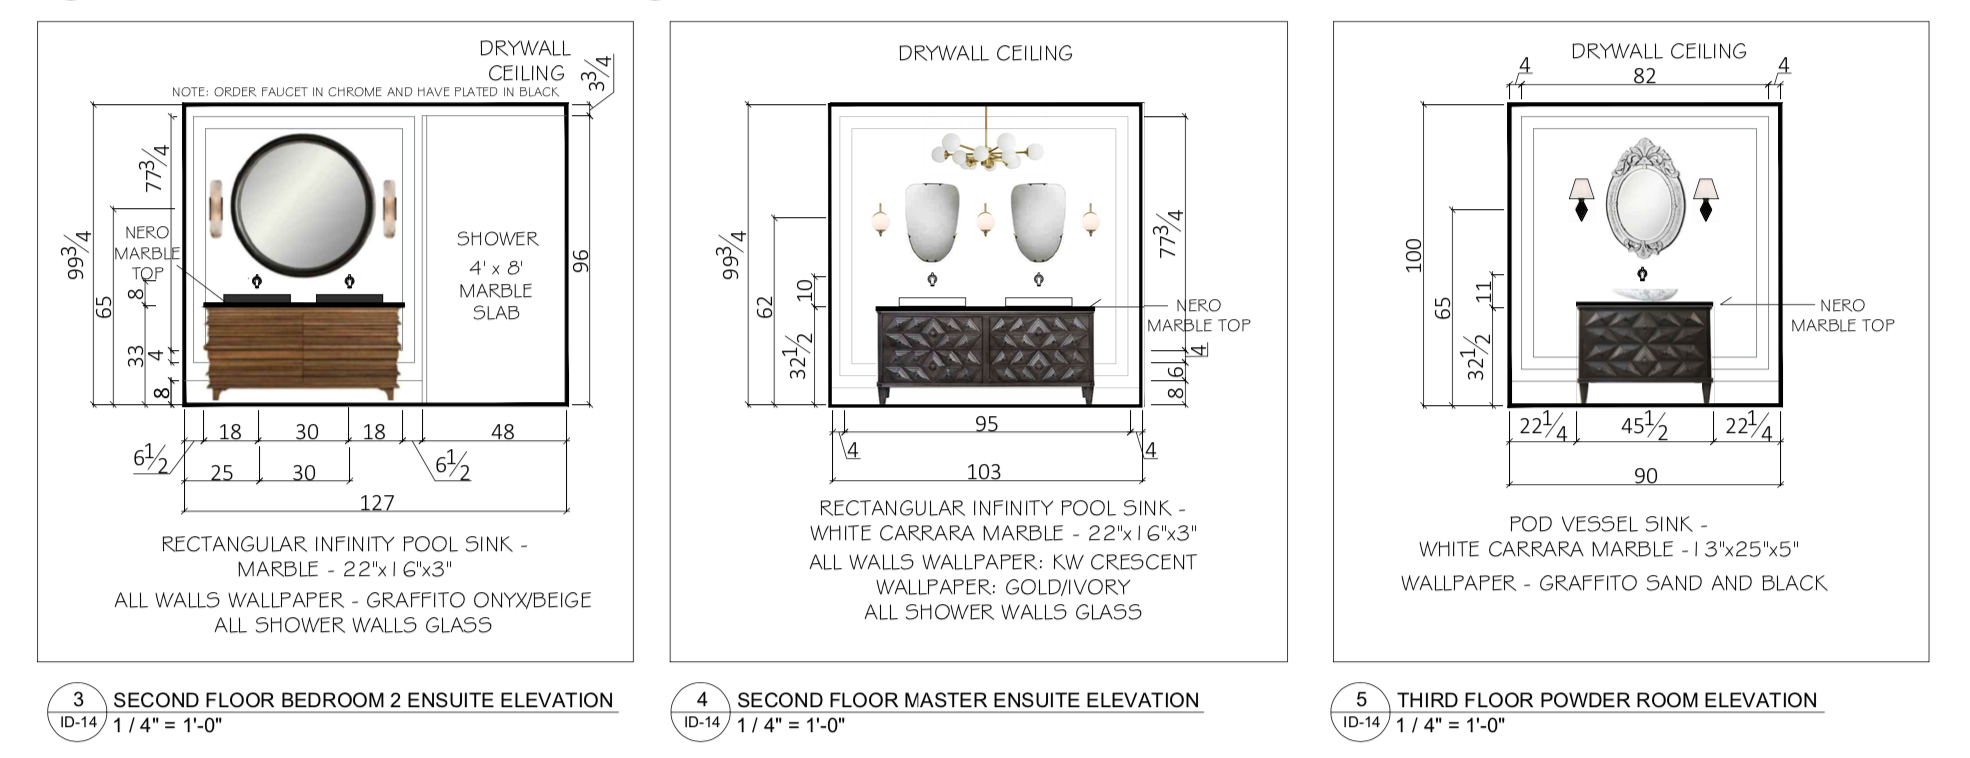 Bathroom Design.png